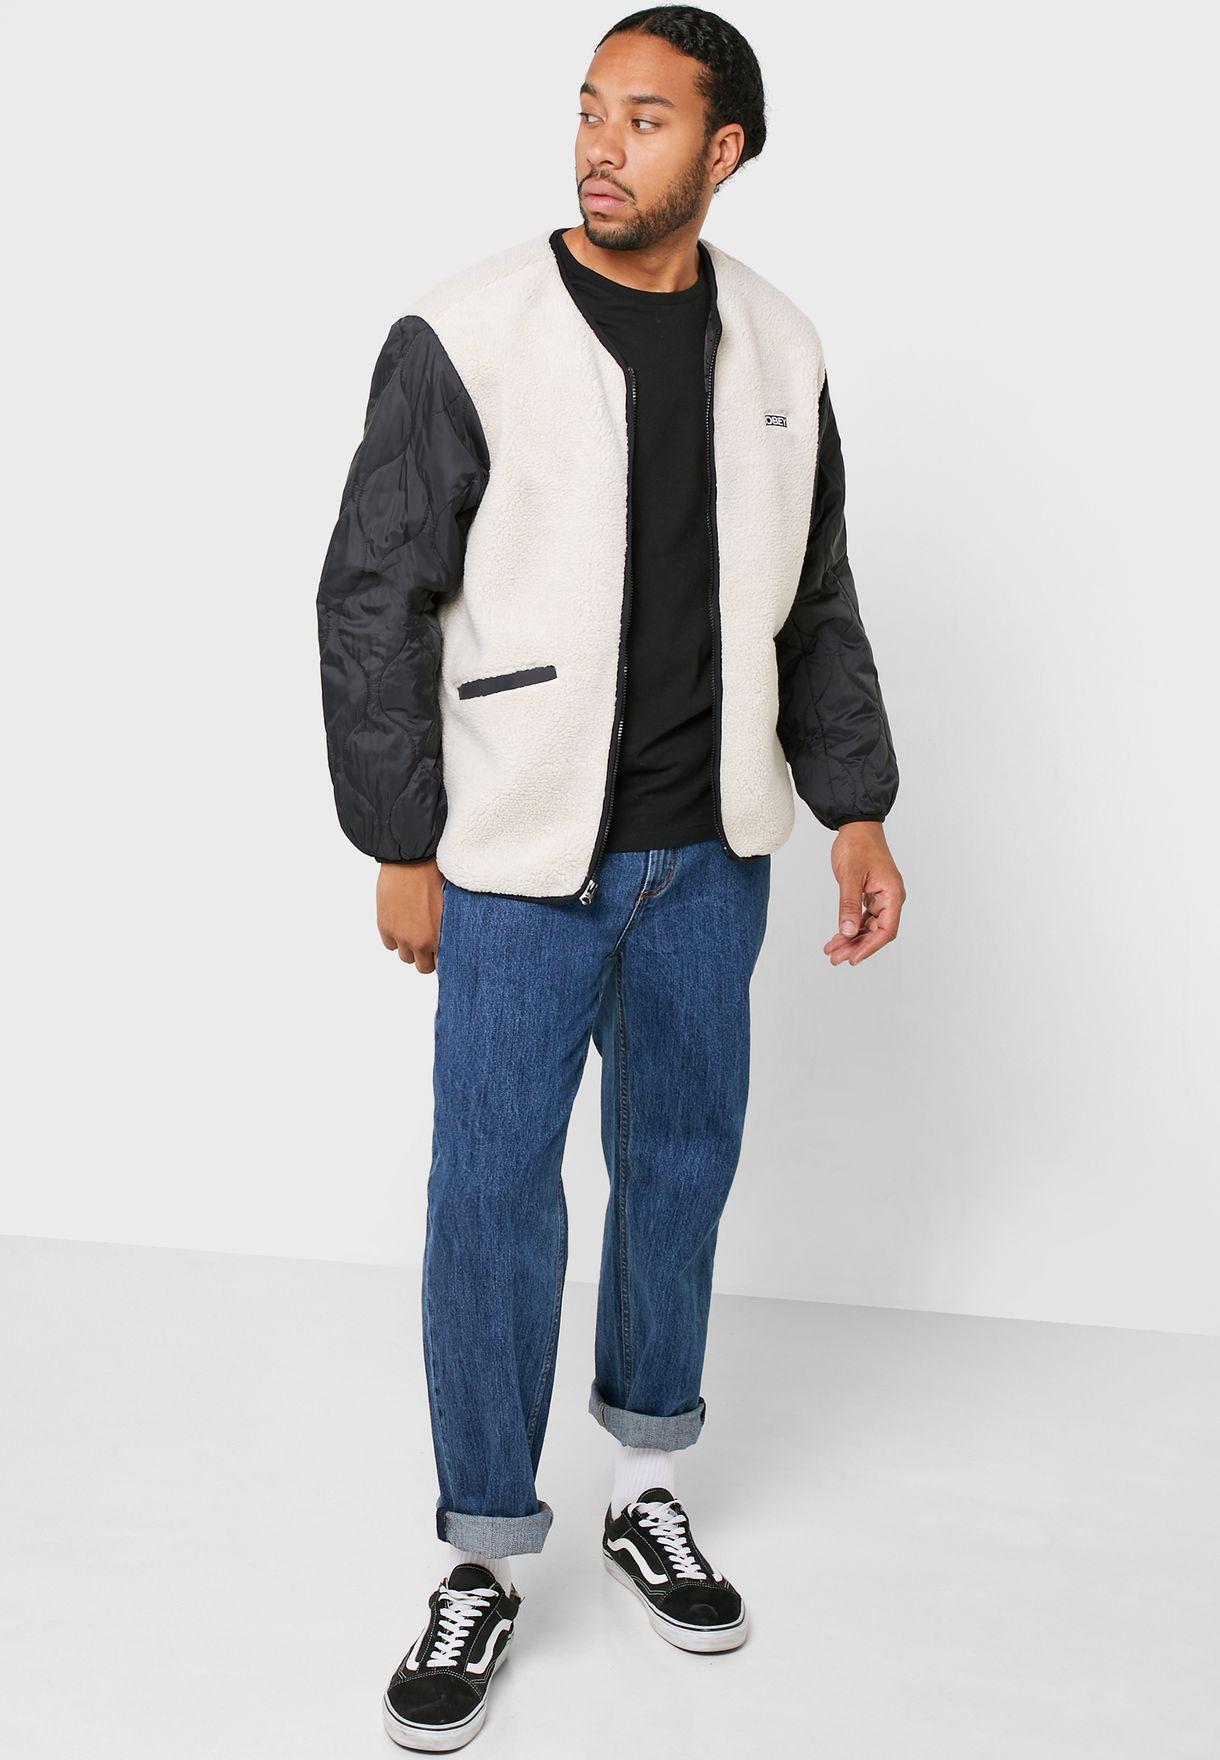 Oyster Jacket